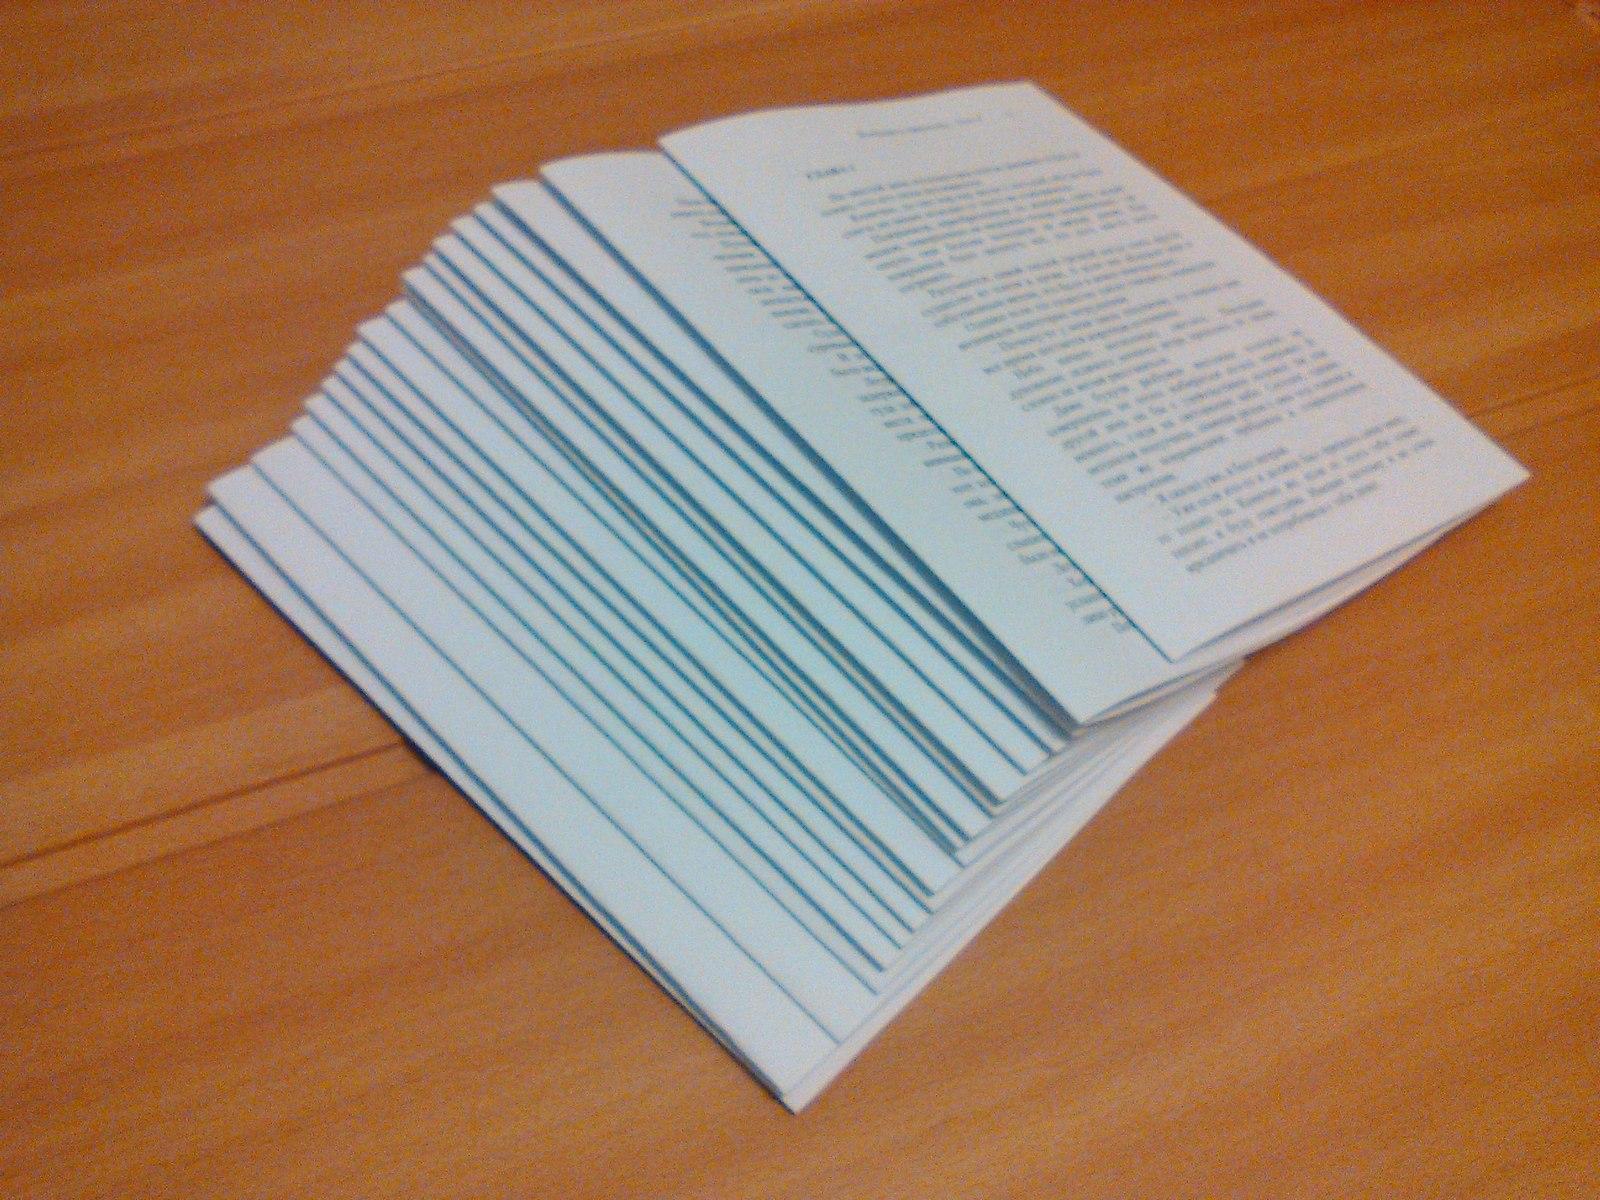 Создание книги своими руками фото 205